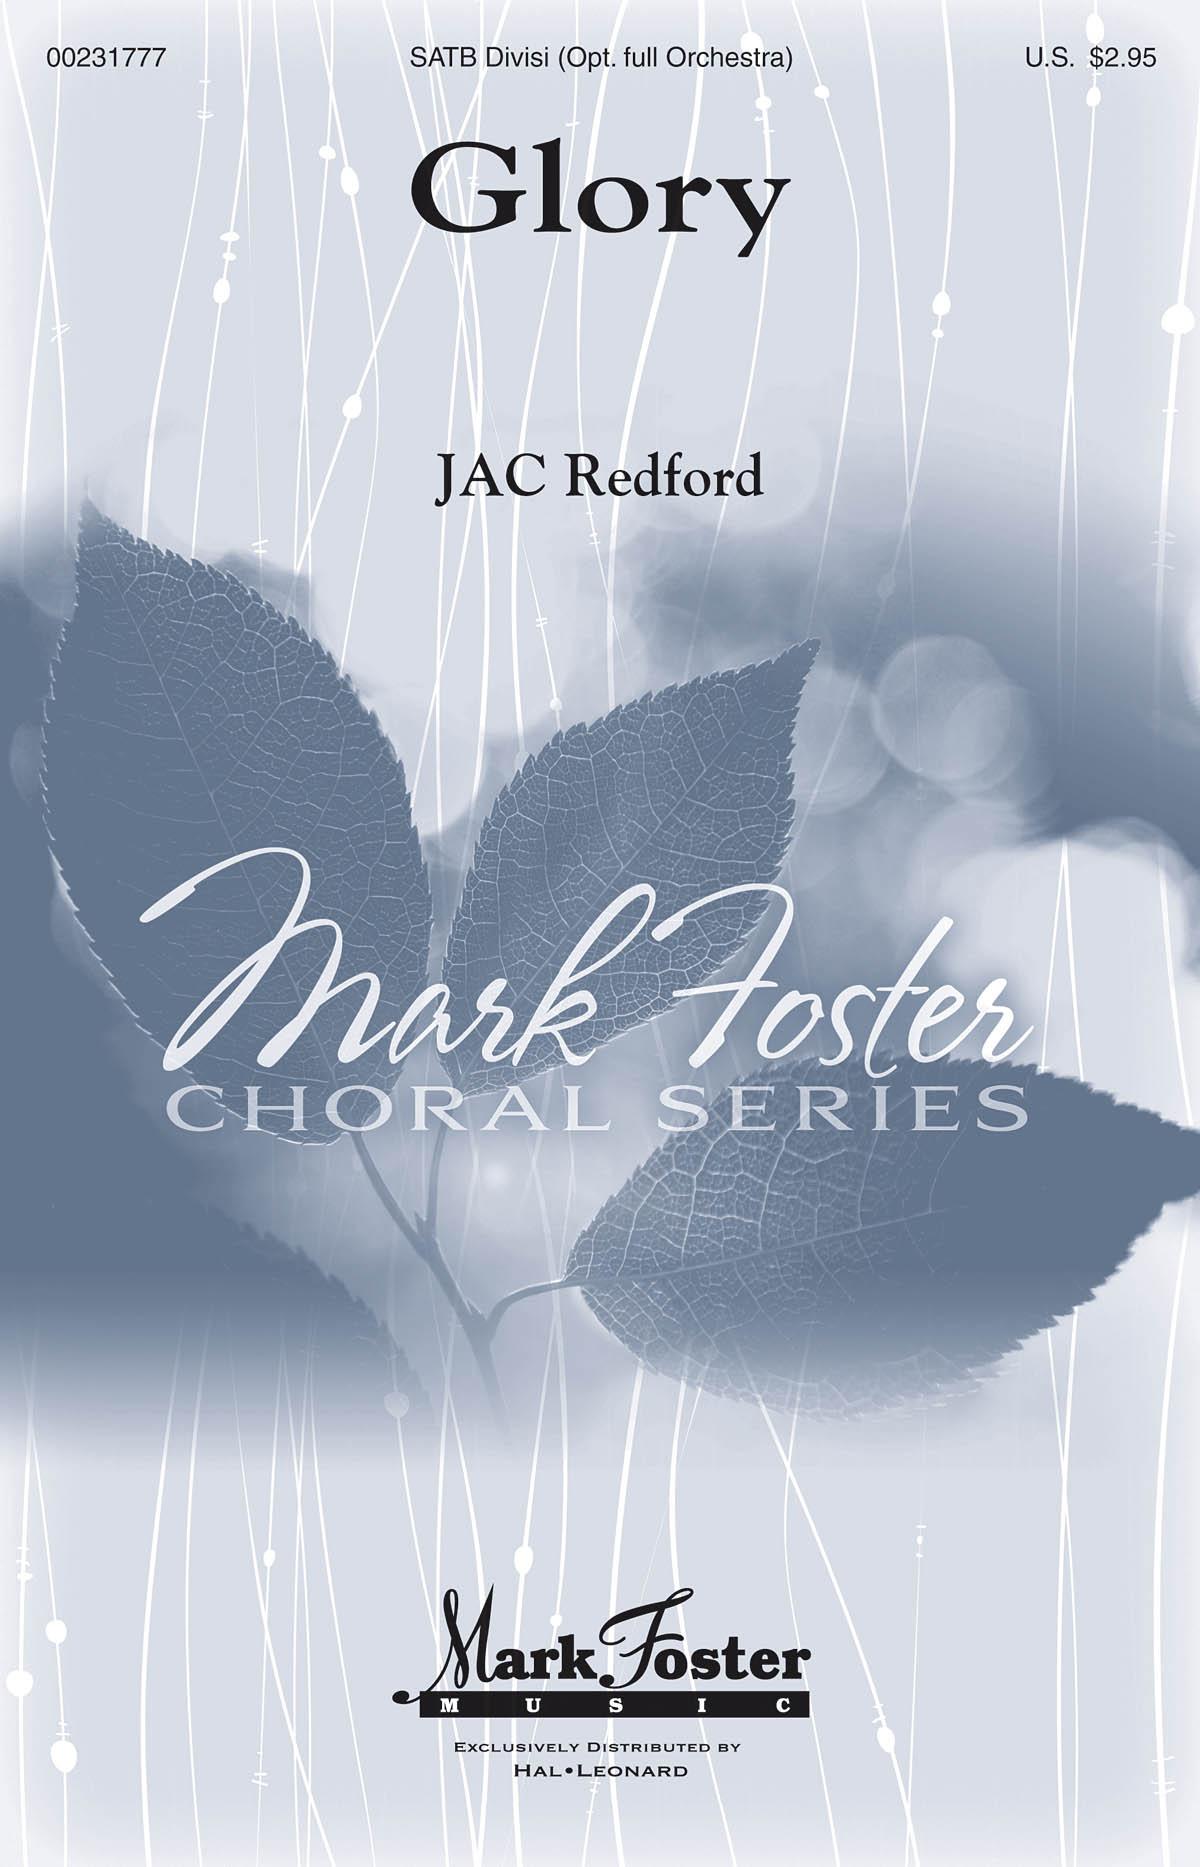 J.A.C. Redford: Glory: Mixed Choir a Cappella: Vocal Score